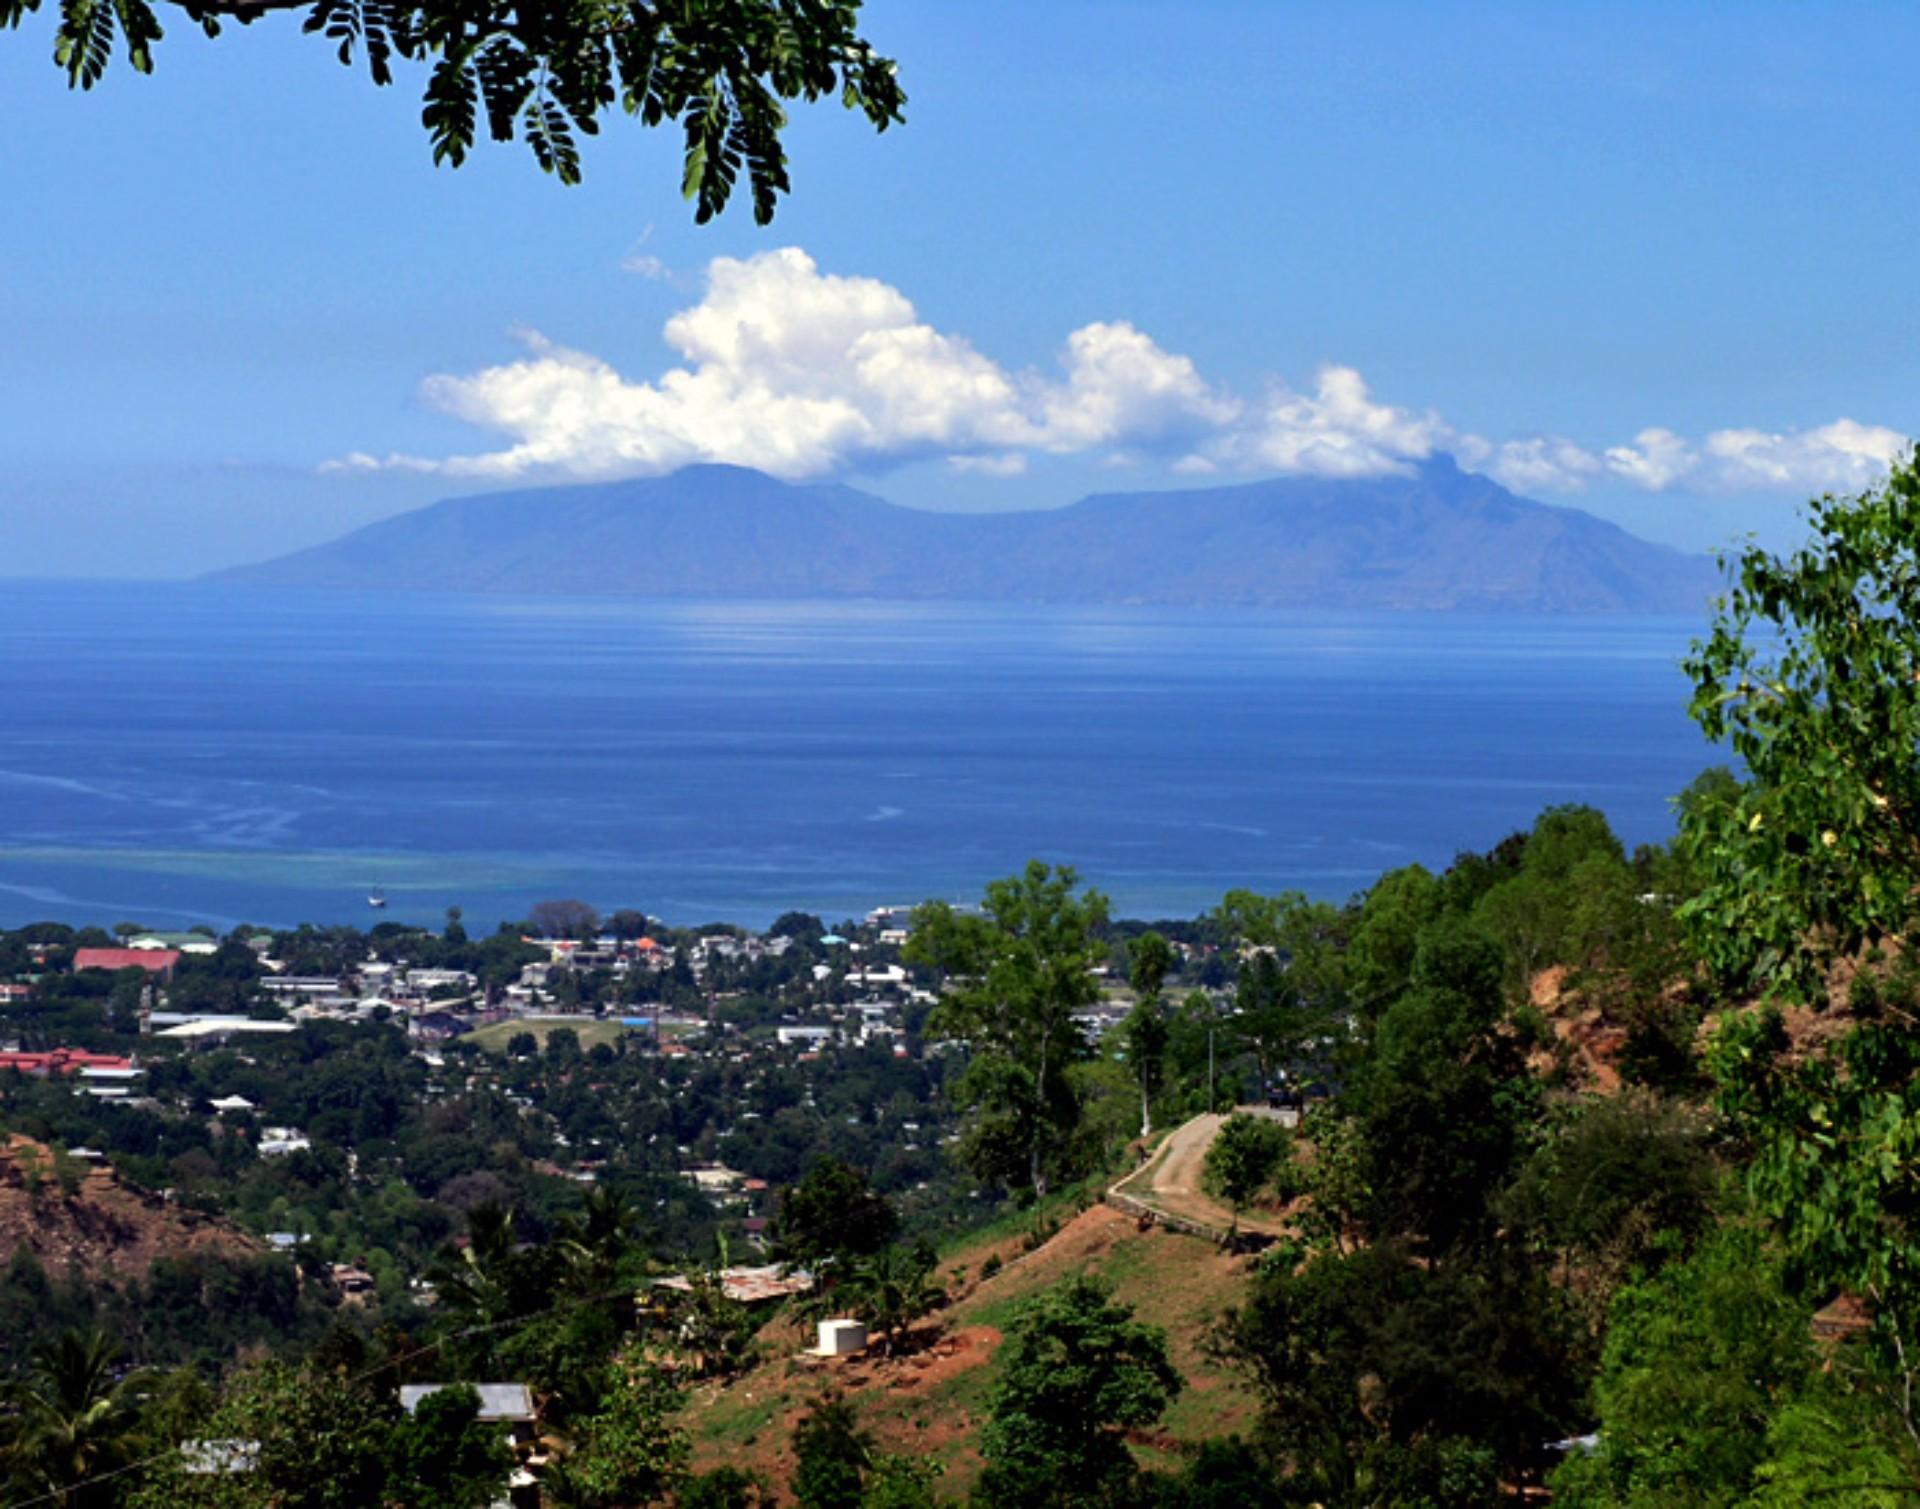 Timor Leste Population in 2017